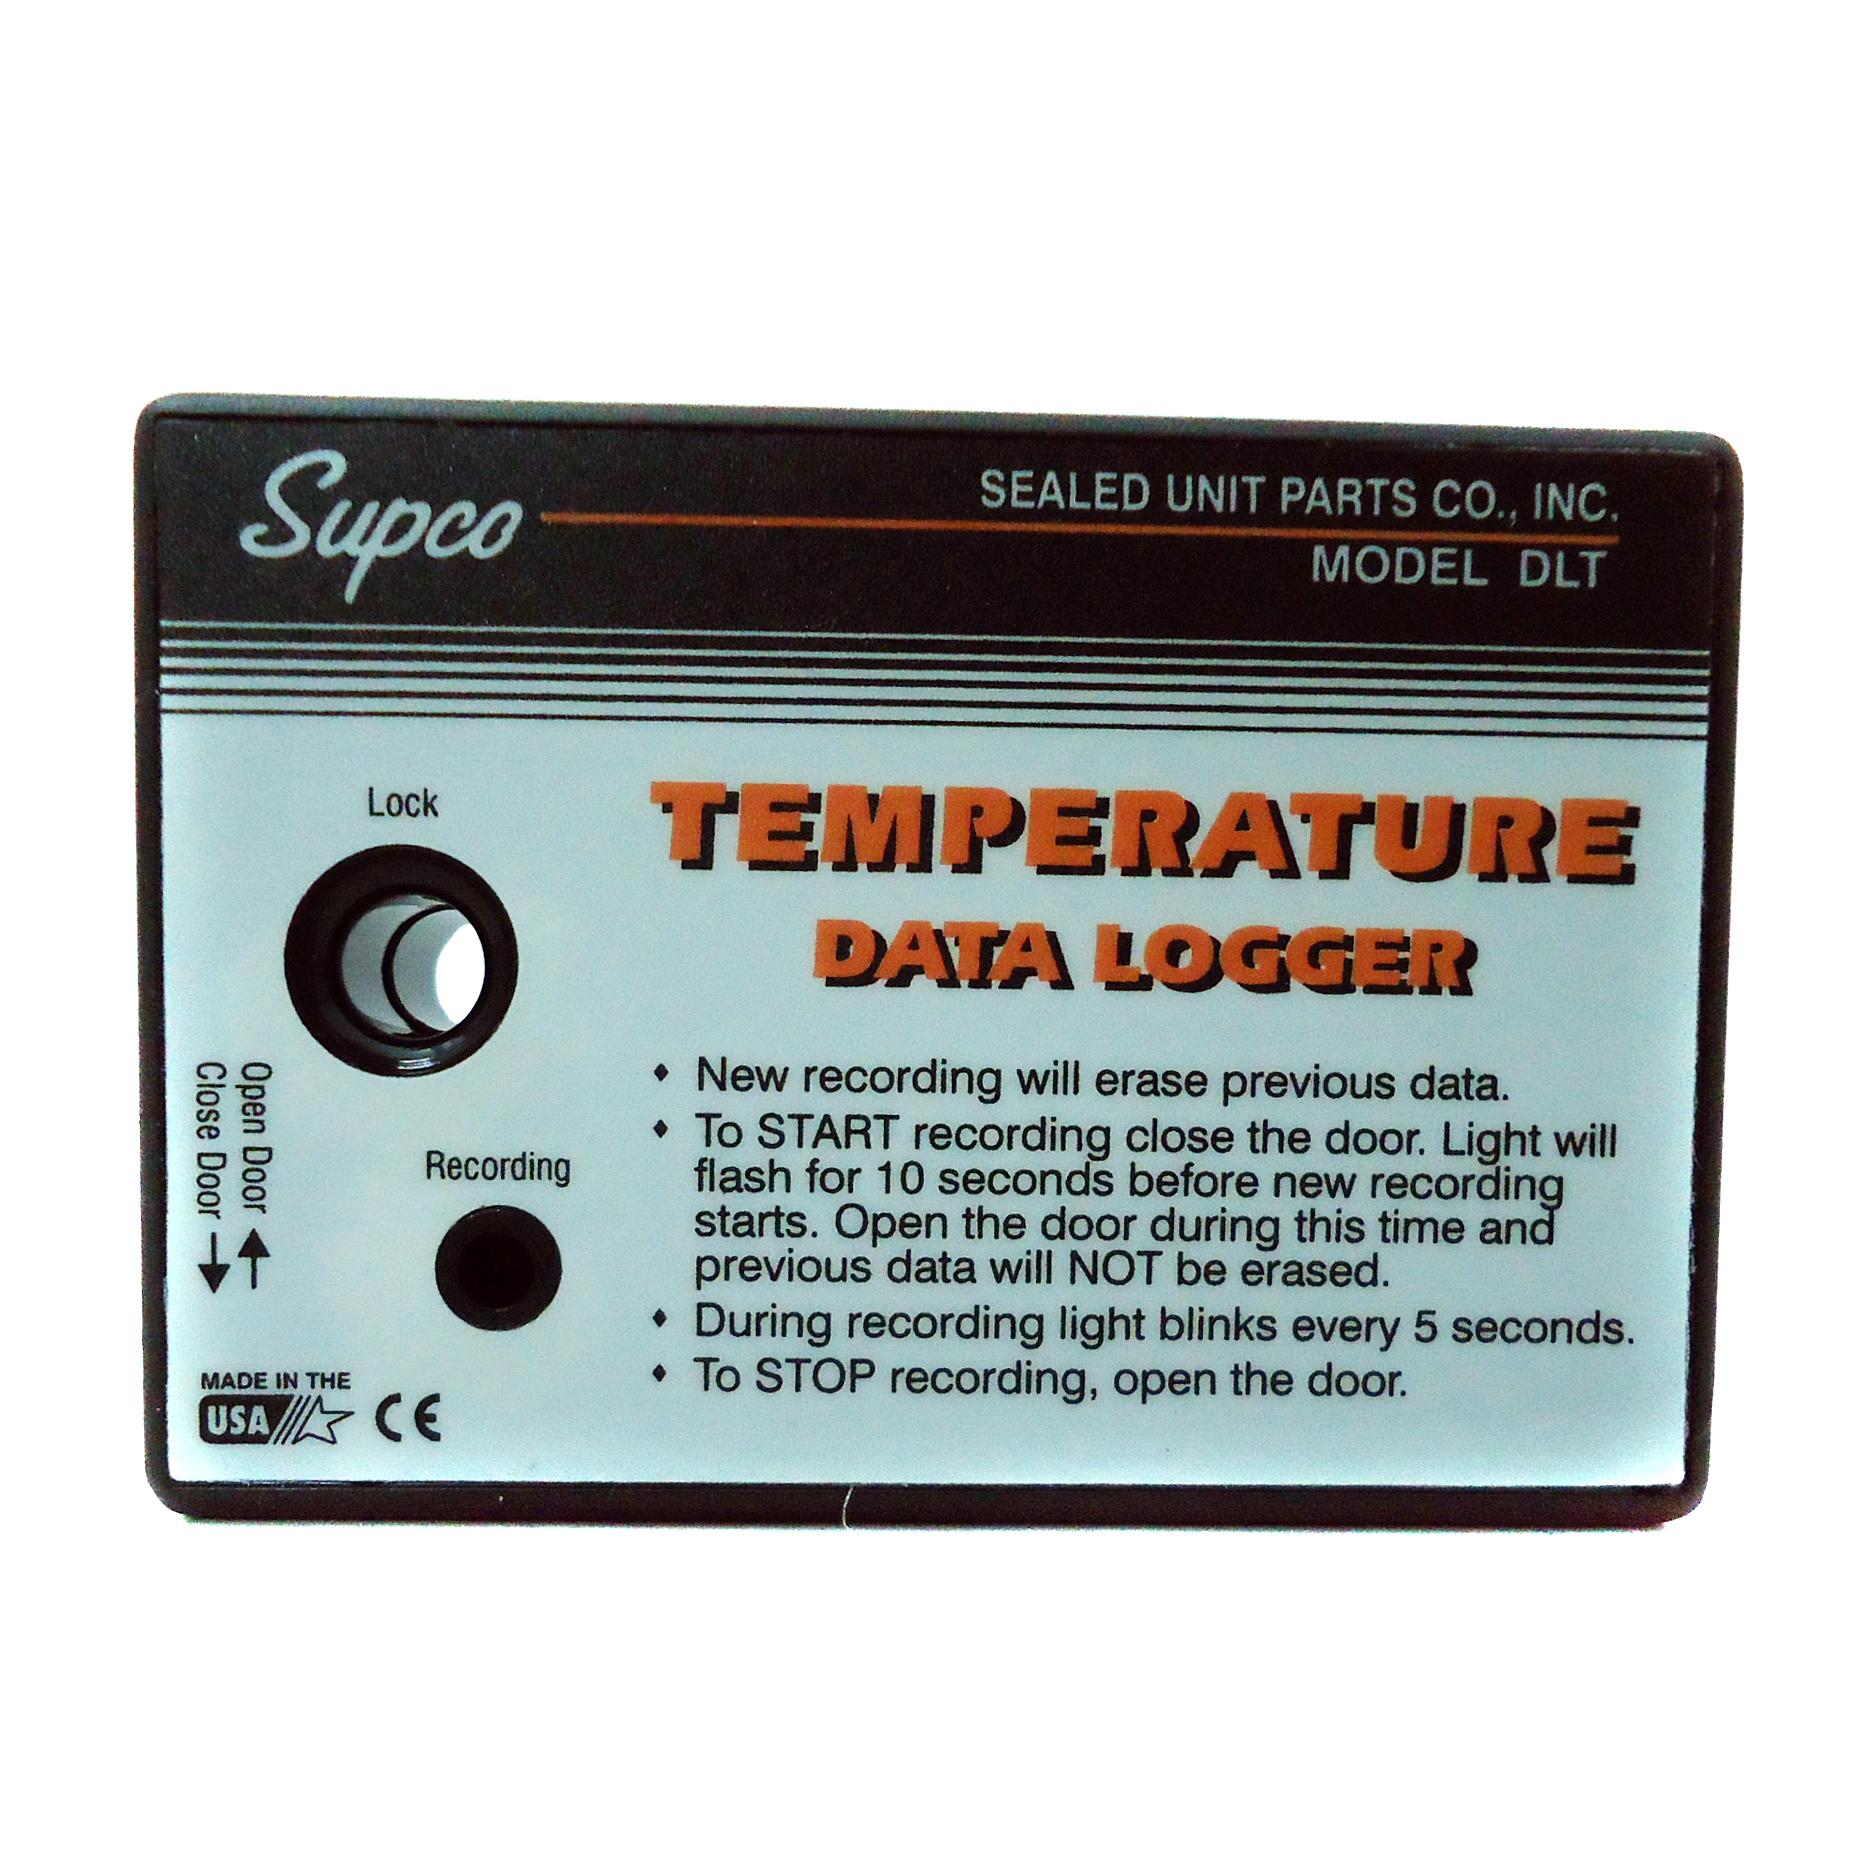 SUPCO DATA LOGGER DLT Καταγραφικό Θερμοκρασίας με εσωτερικό αισθητήρα προσφορές   αυτοματισμοί  home page   best price   αυτοματισμοί  αυτοματισμοί